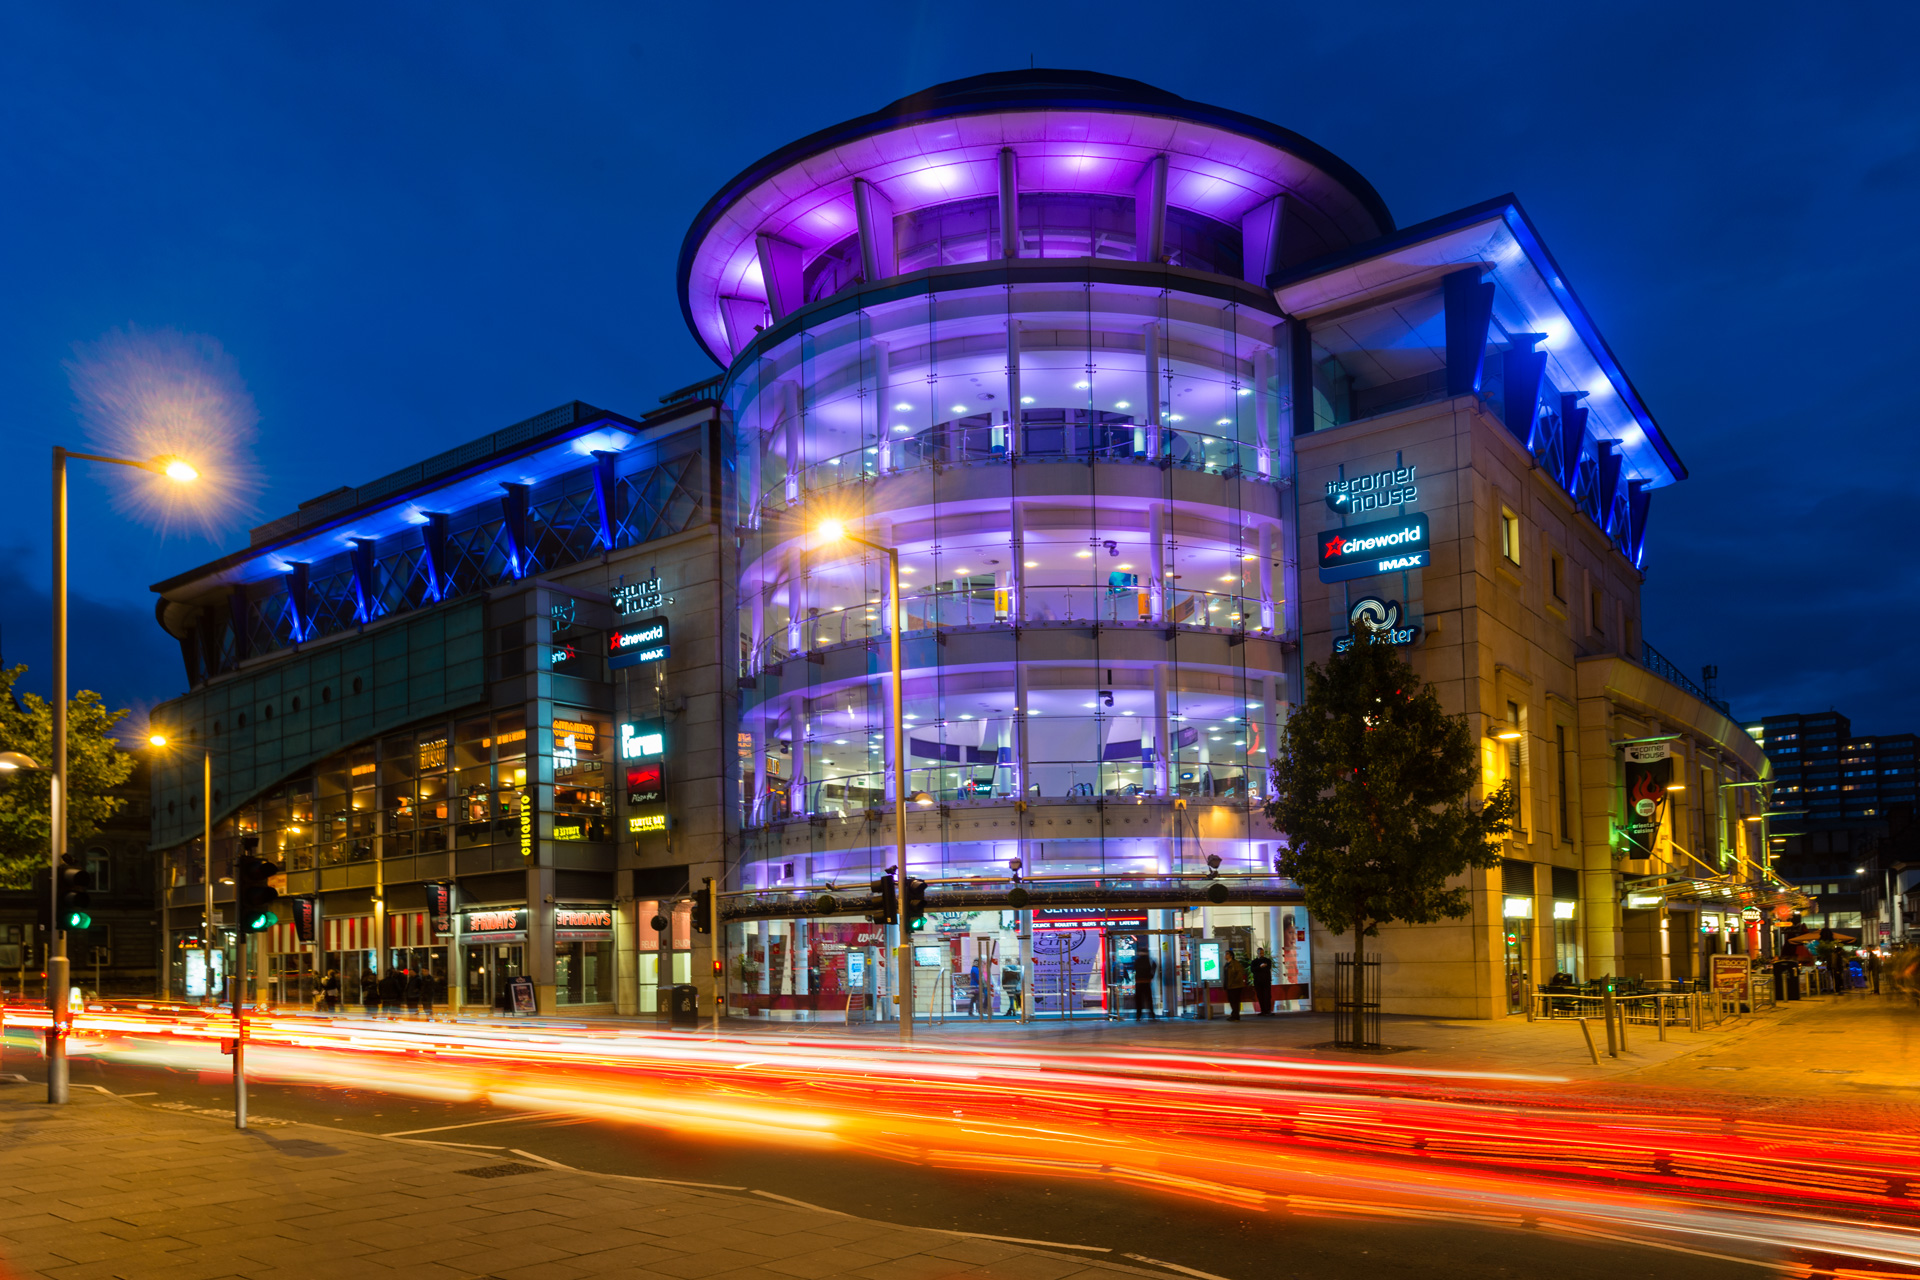 Cornerhouse, Nottingham